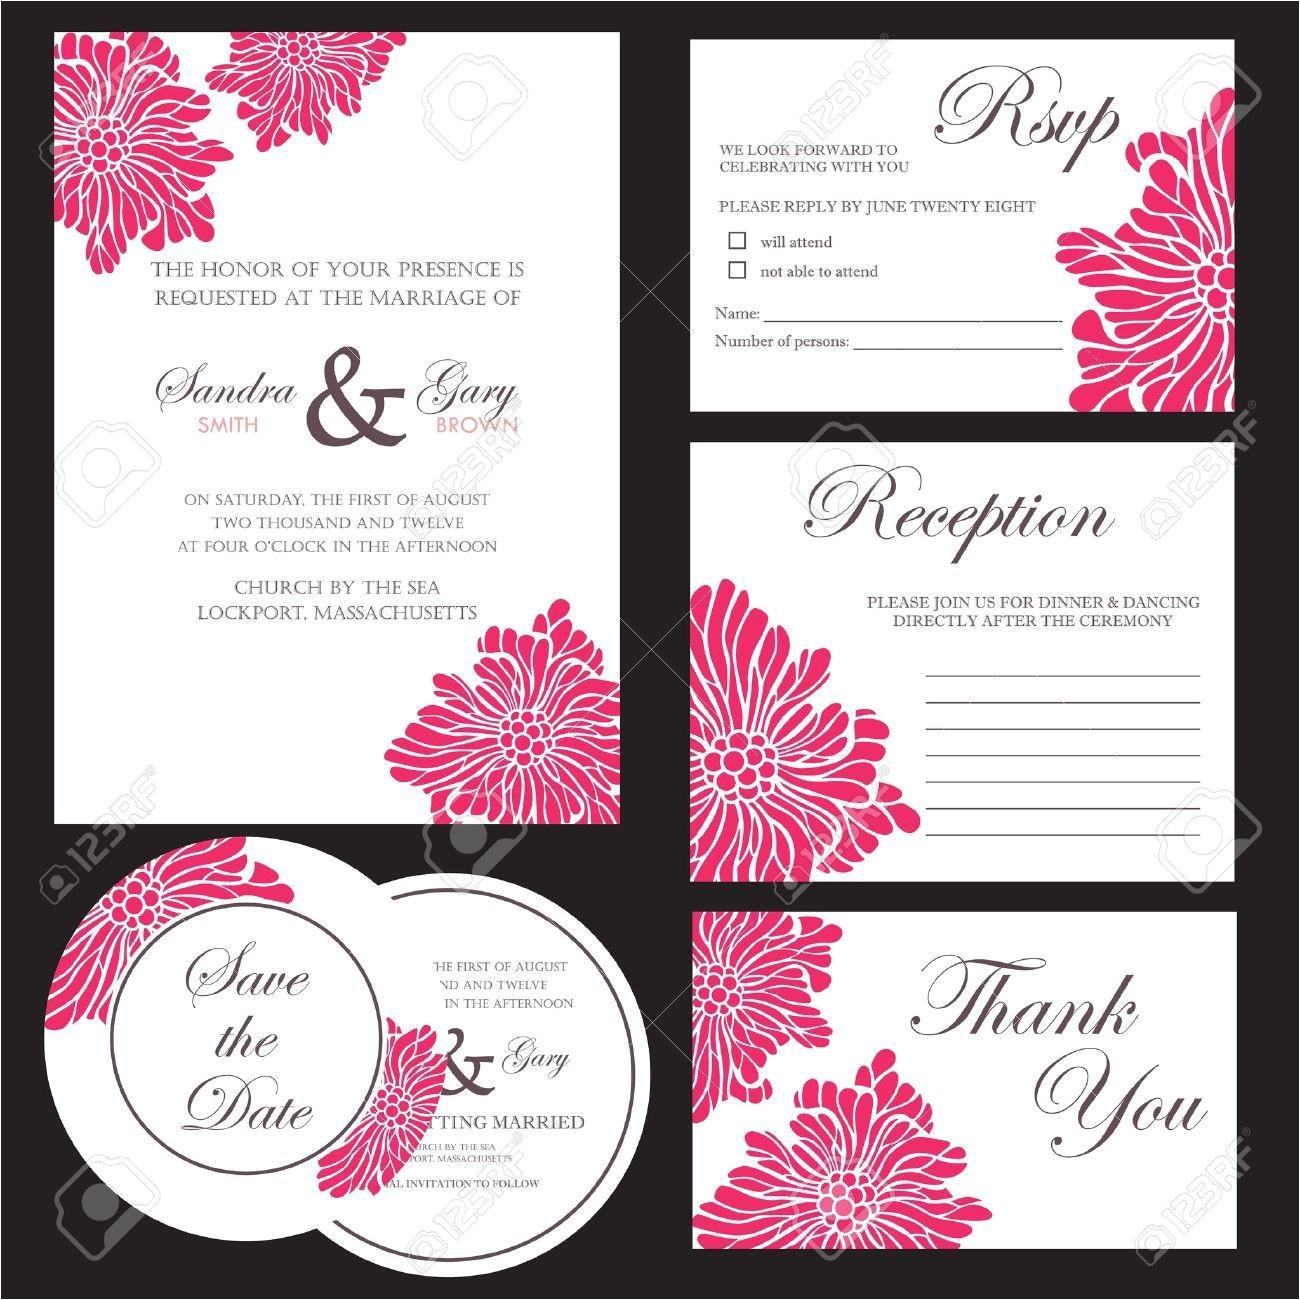 Nicest Wedding Invitations Best Wedding Invitations Cards Best Wedding Cards